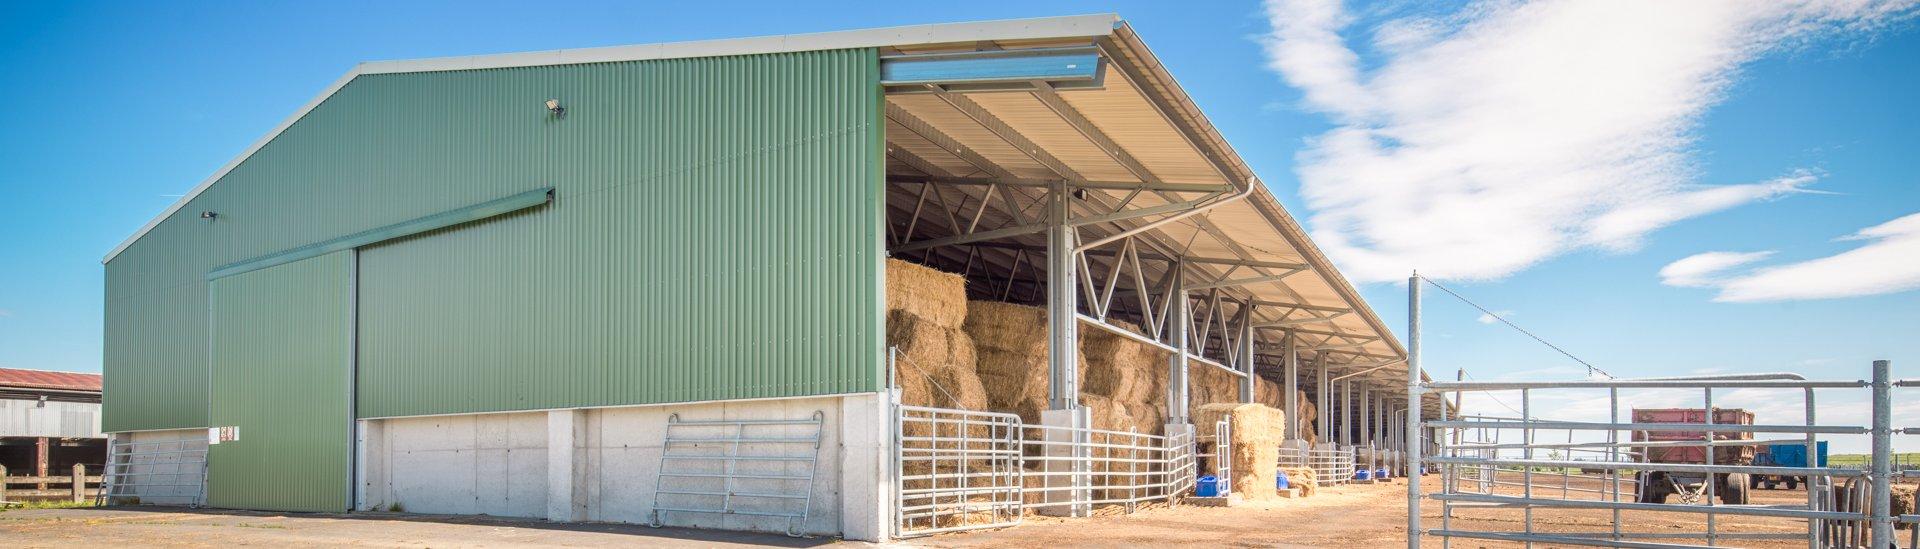 Farm building CZ0106 Unigranit